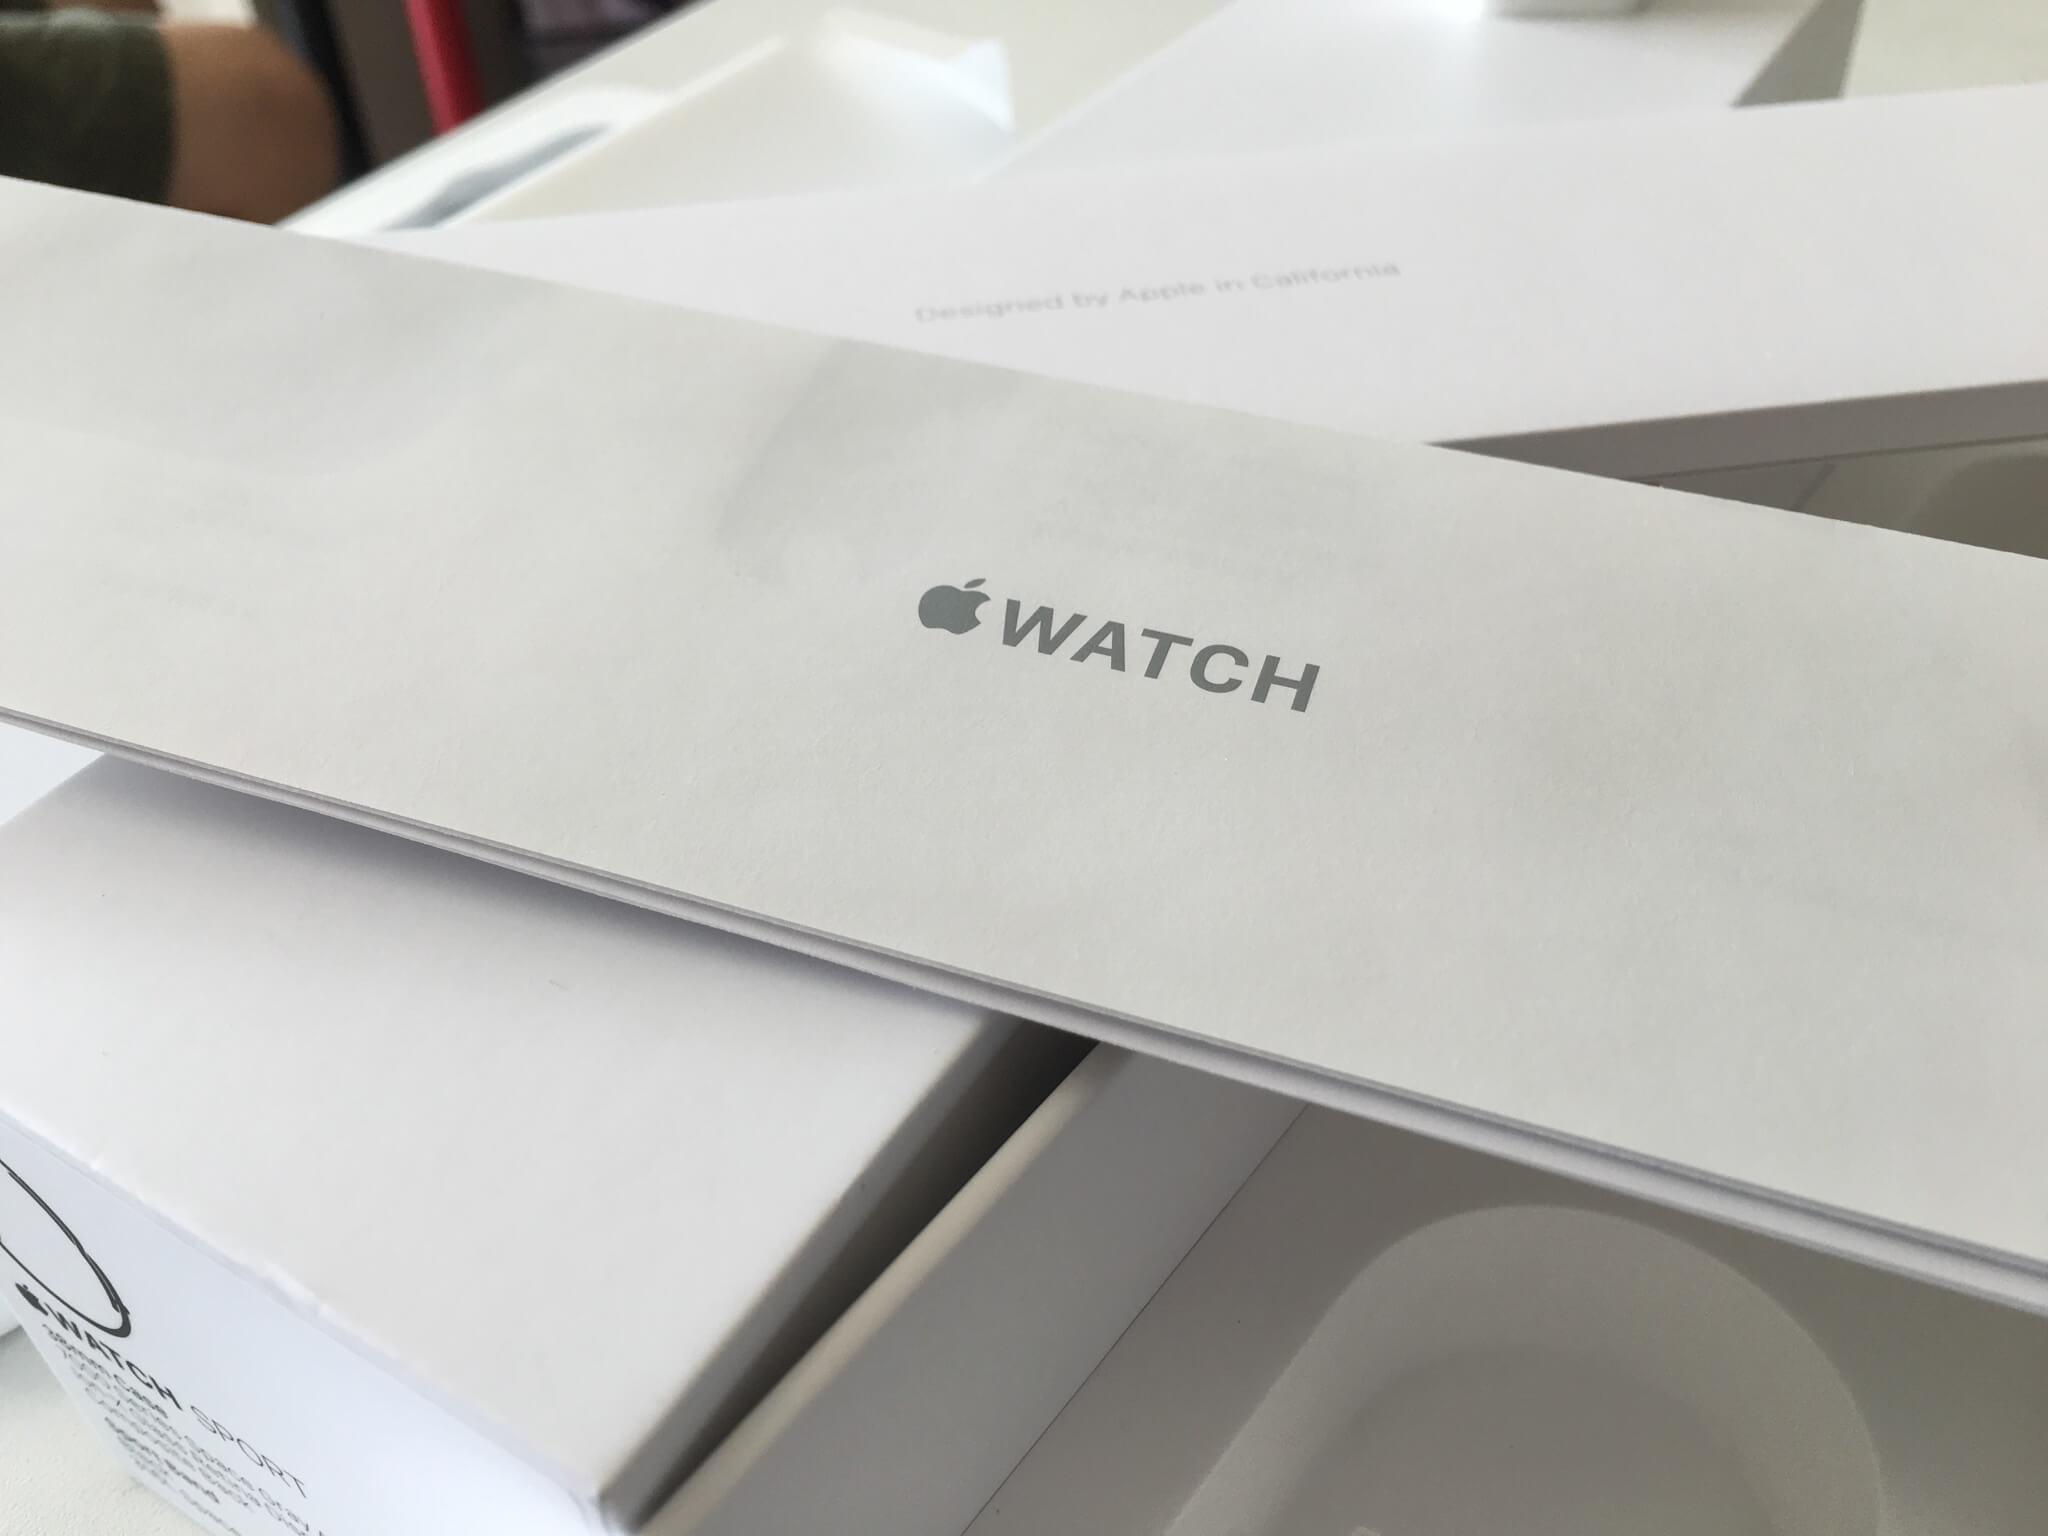 Apple Watch 說明書是使用長條狀的樣式